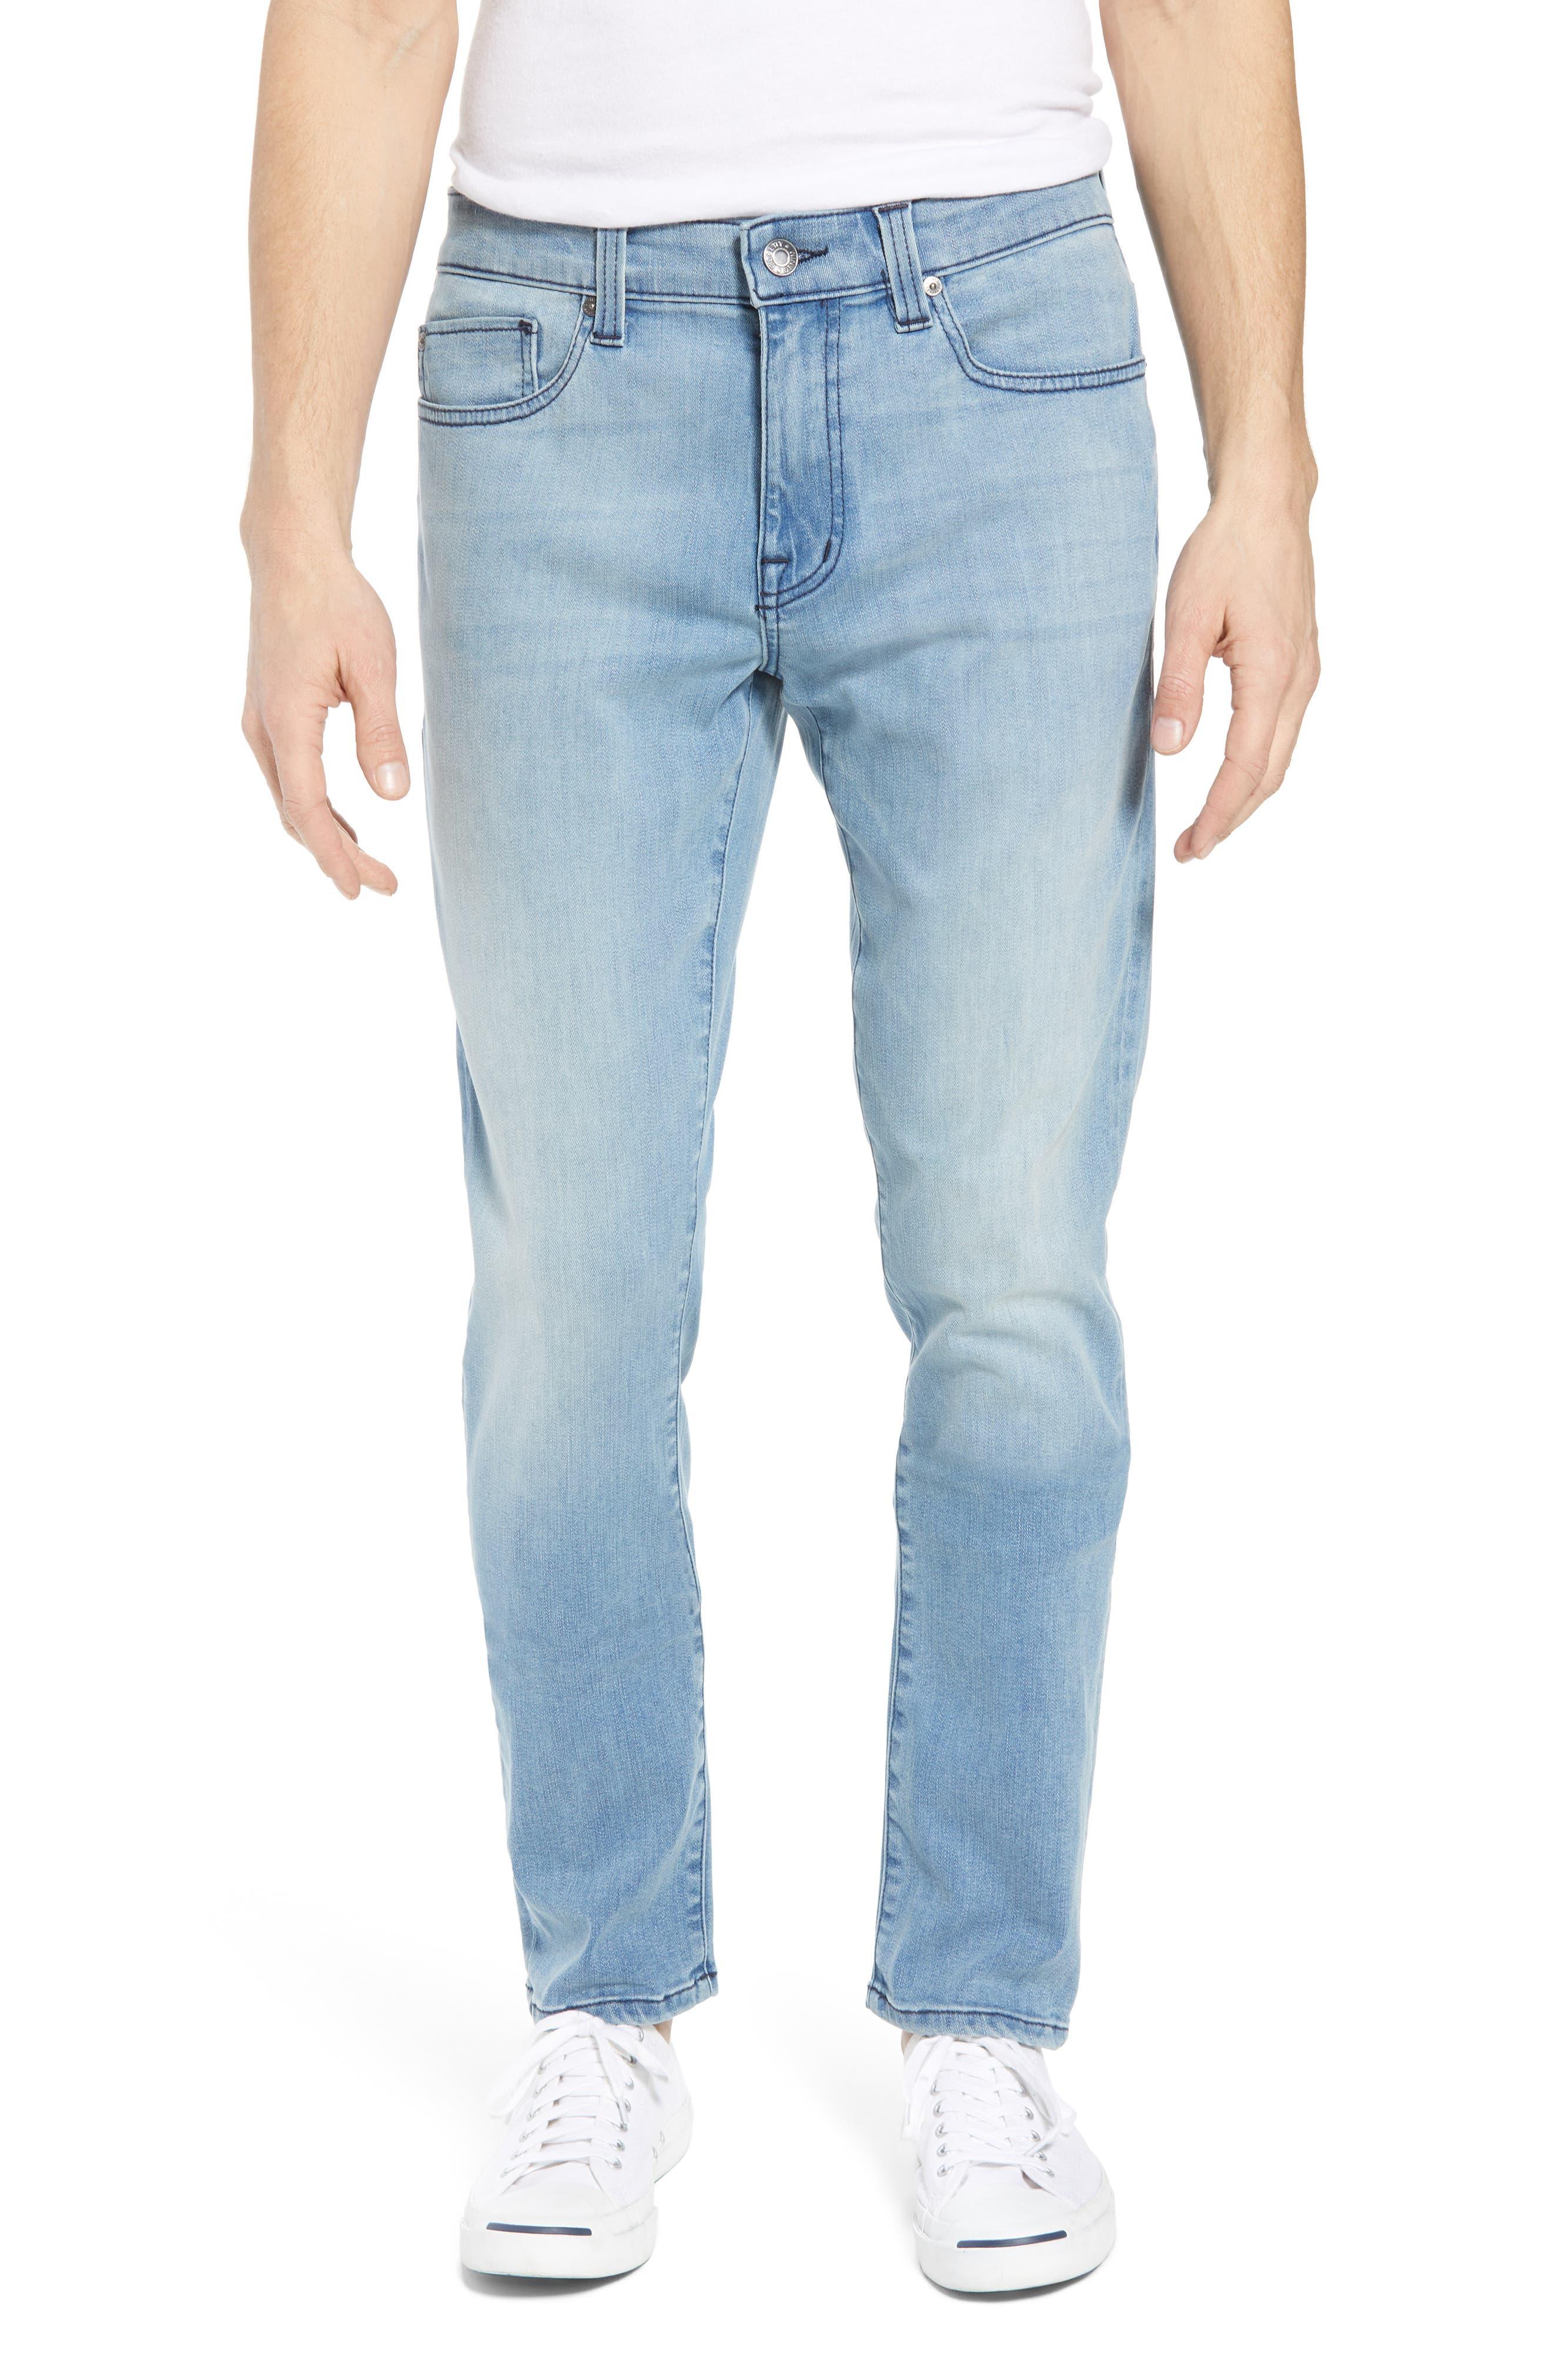 Torino Slim Fit Jeans,                         Main,                         color, Abbey Blue